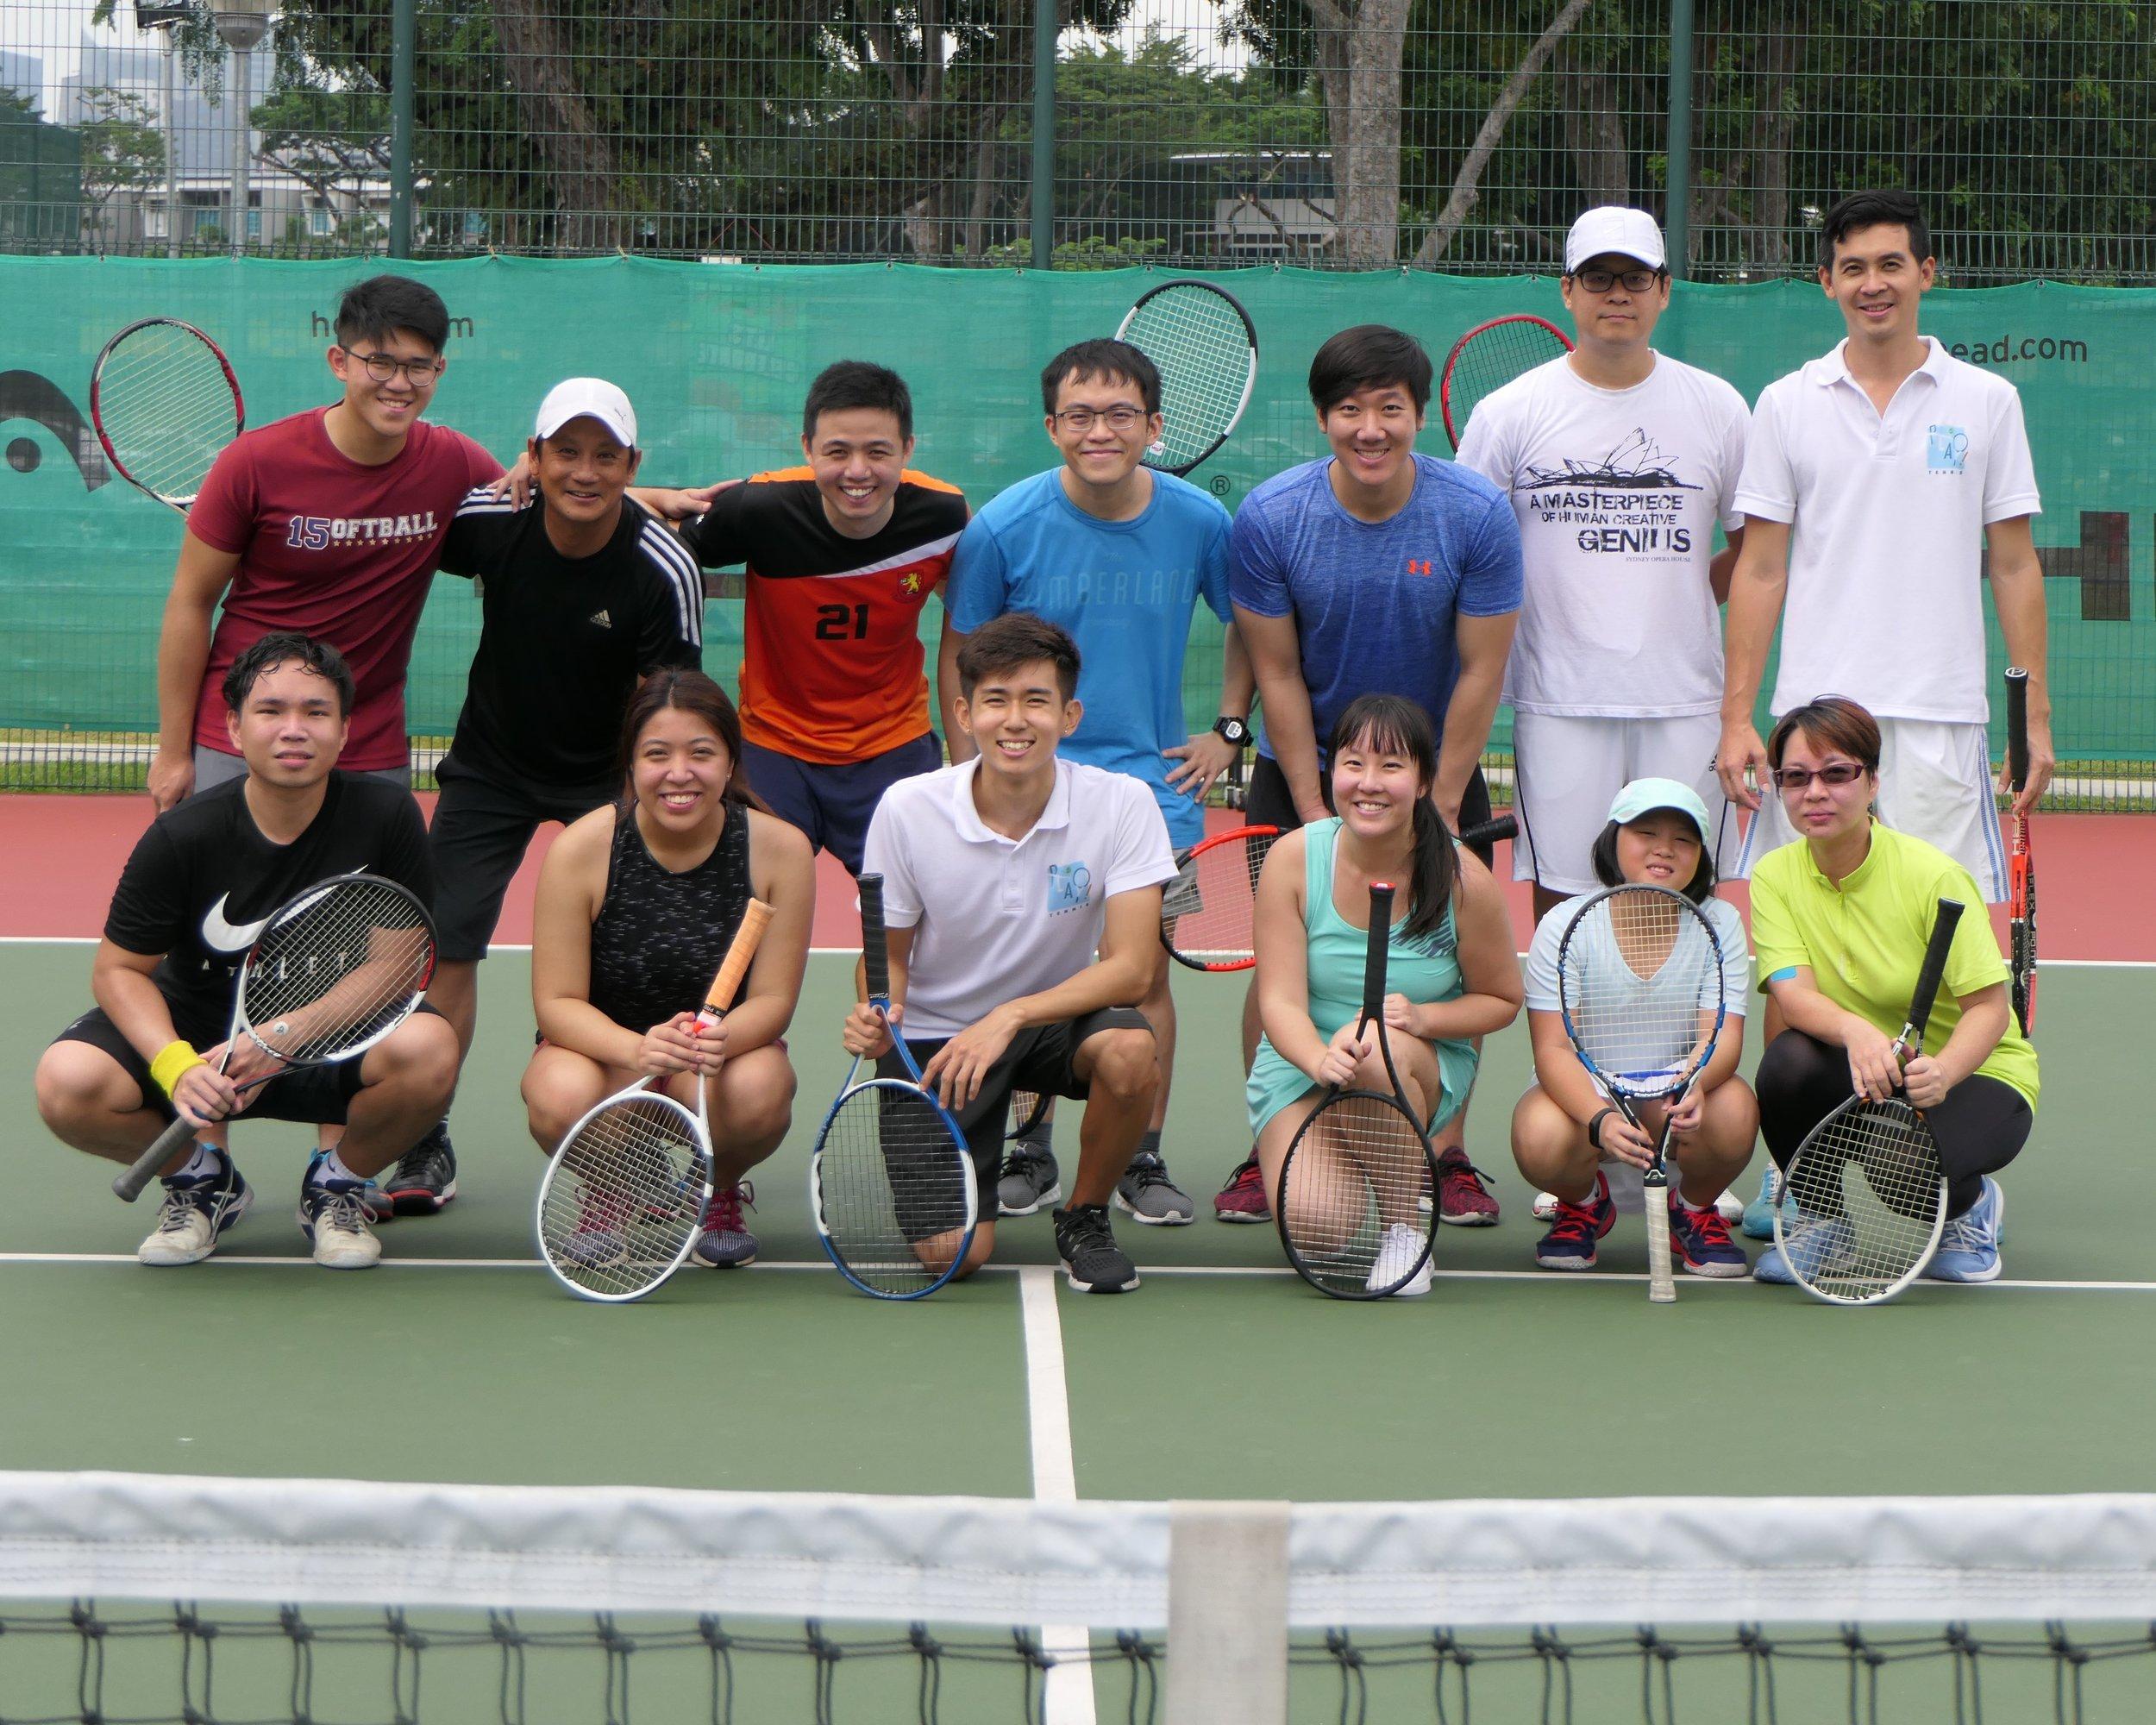 Play Tennis Community